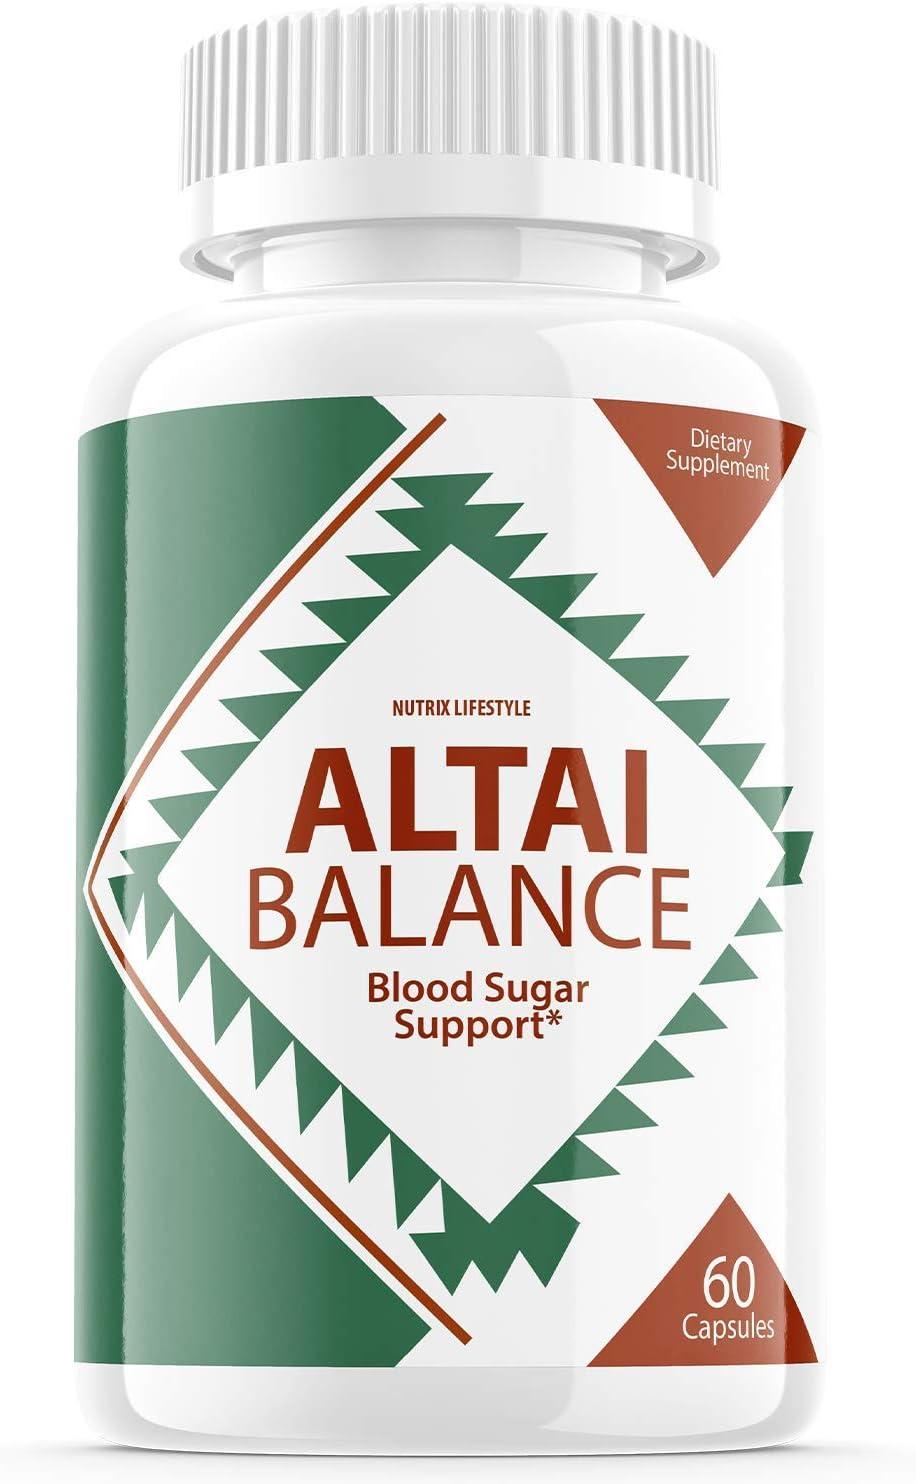 Altai Balance Blood Sugar Support Supplement Pills (60 Capsules)